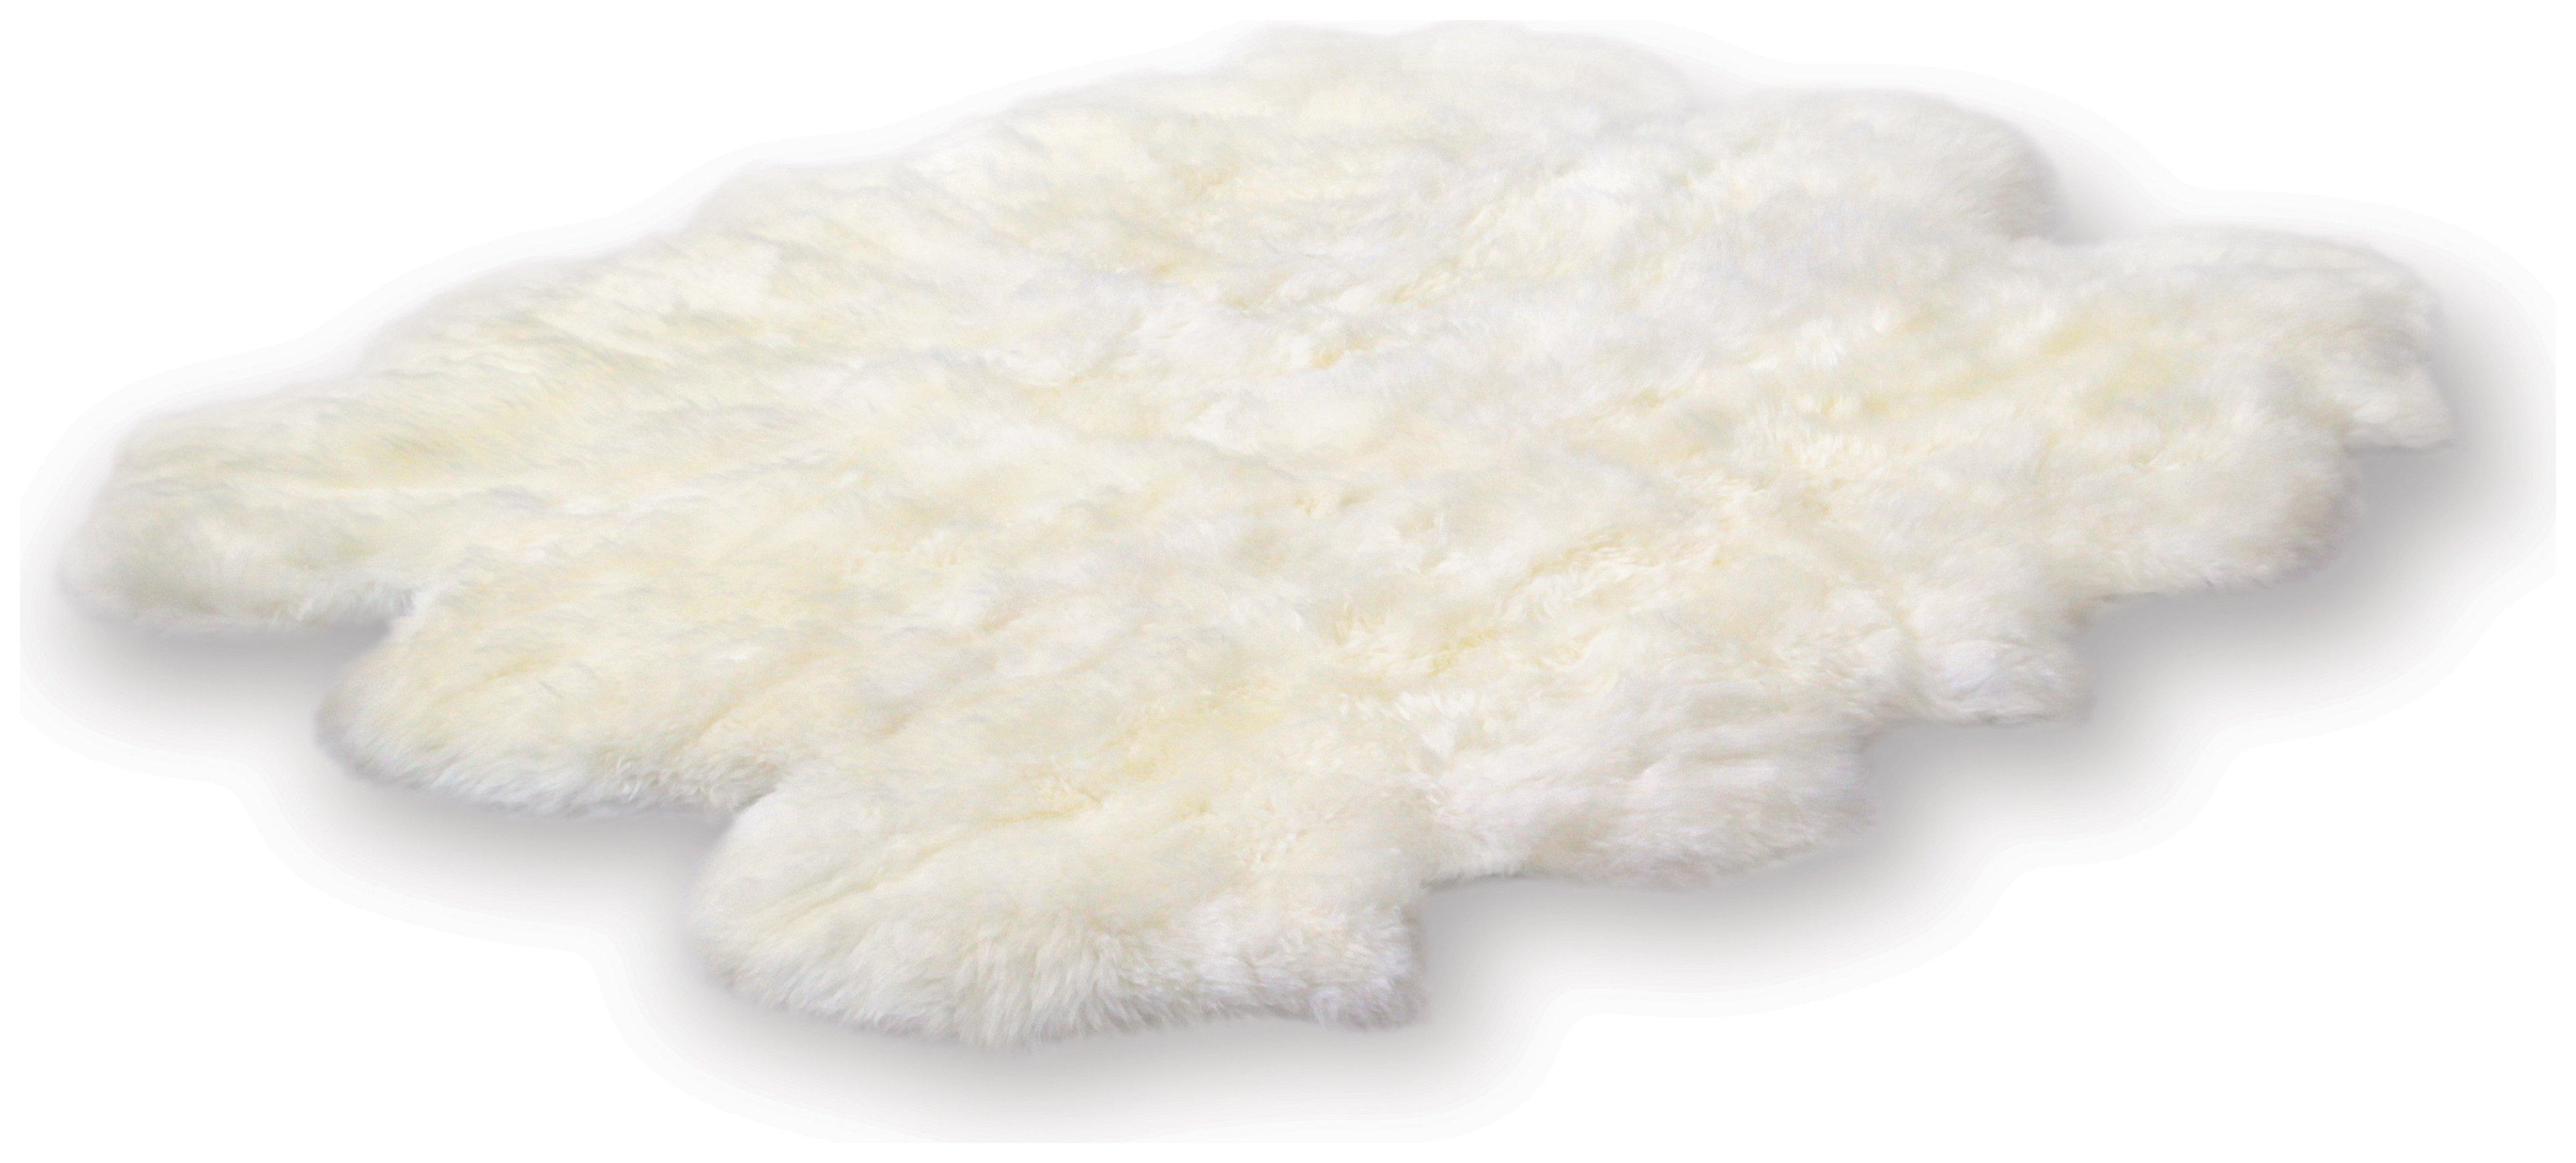 Image of Bowron Sheepskin Longwool Rug 180 x 162cm - Ivory.